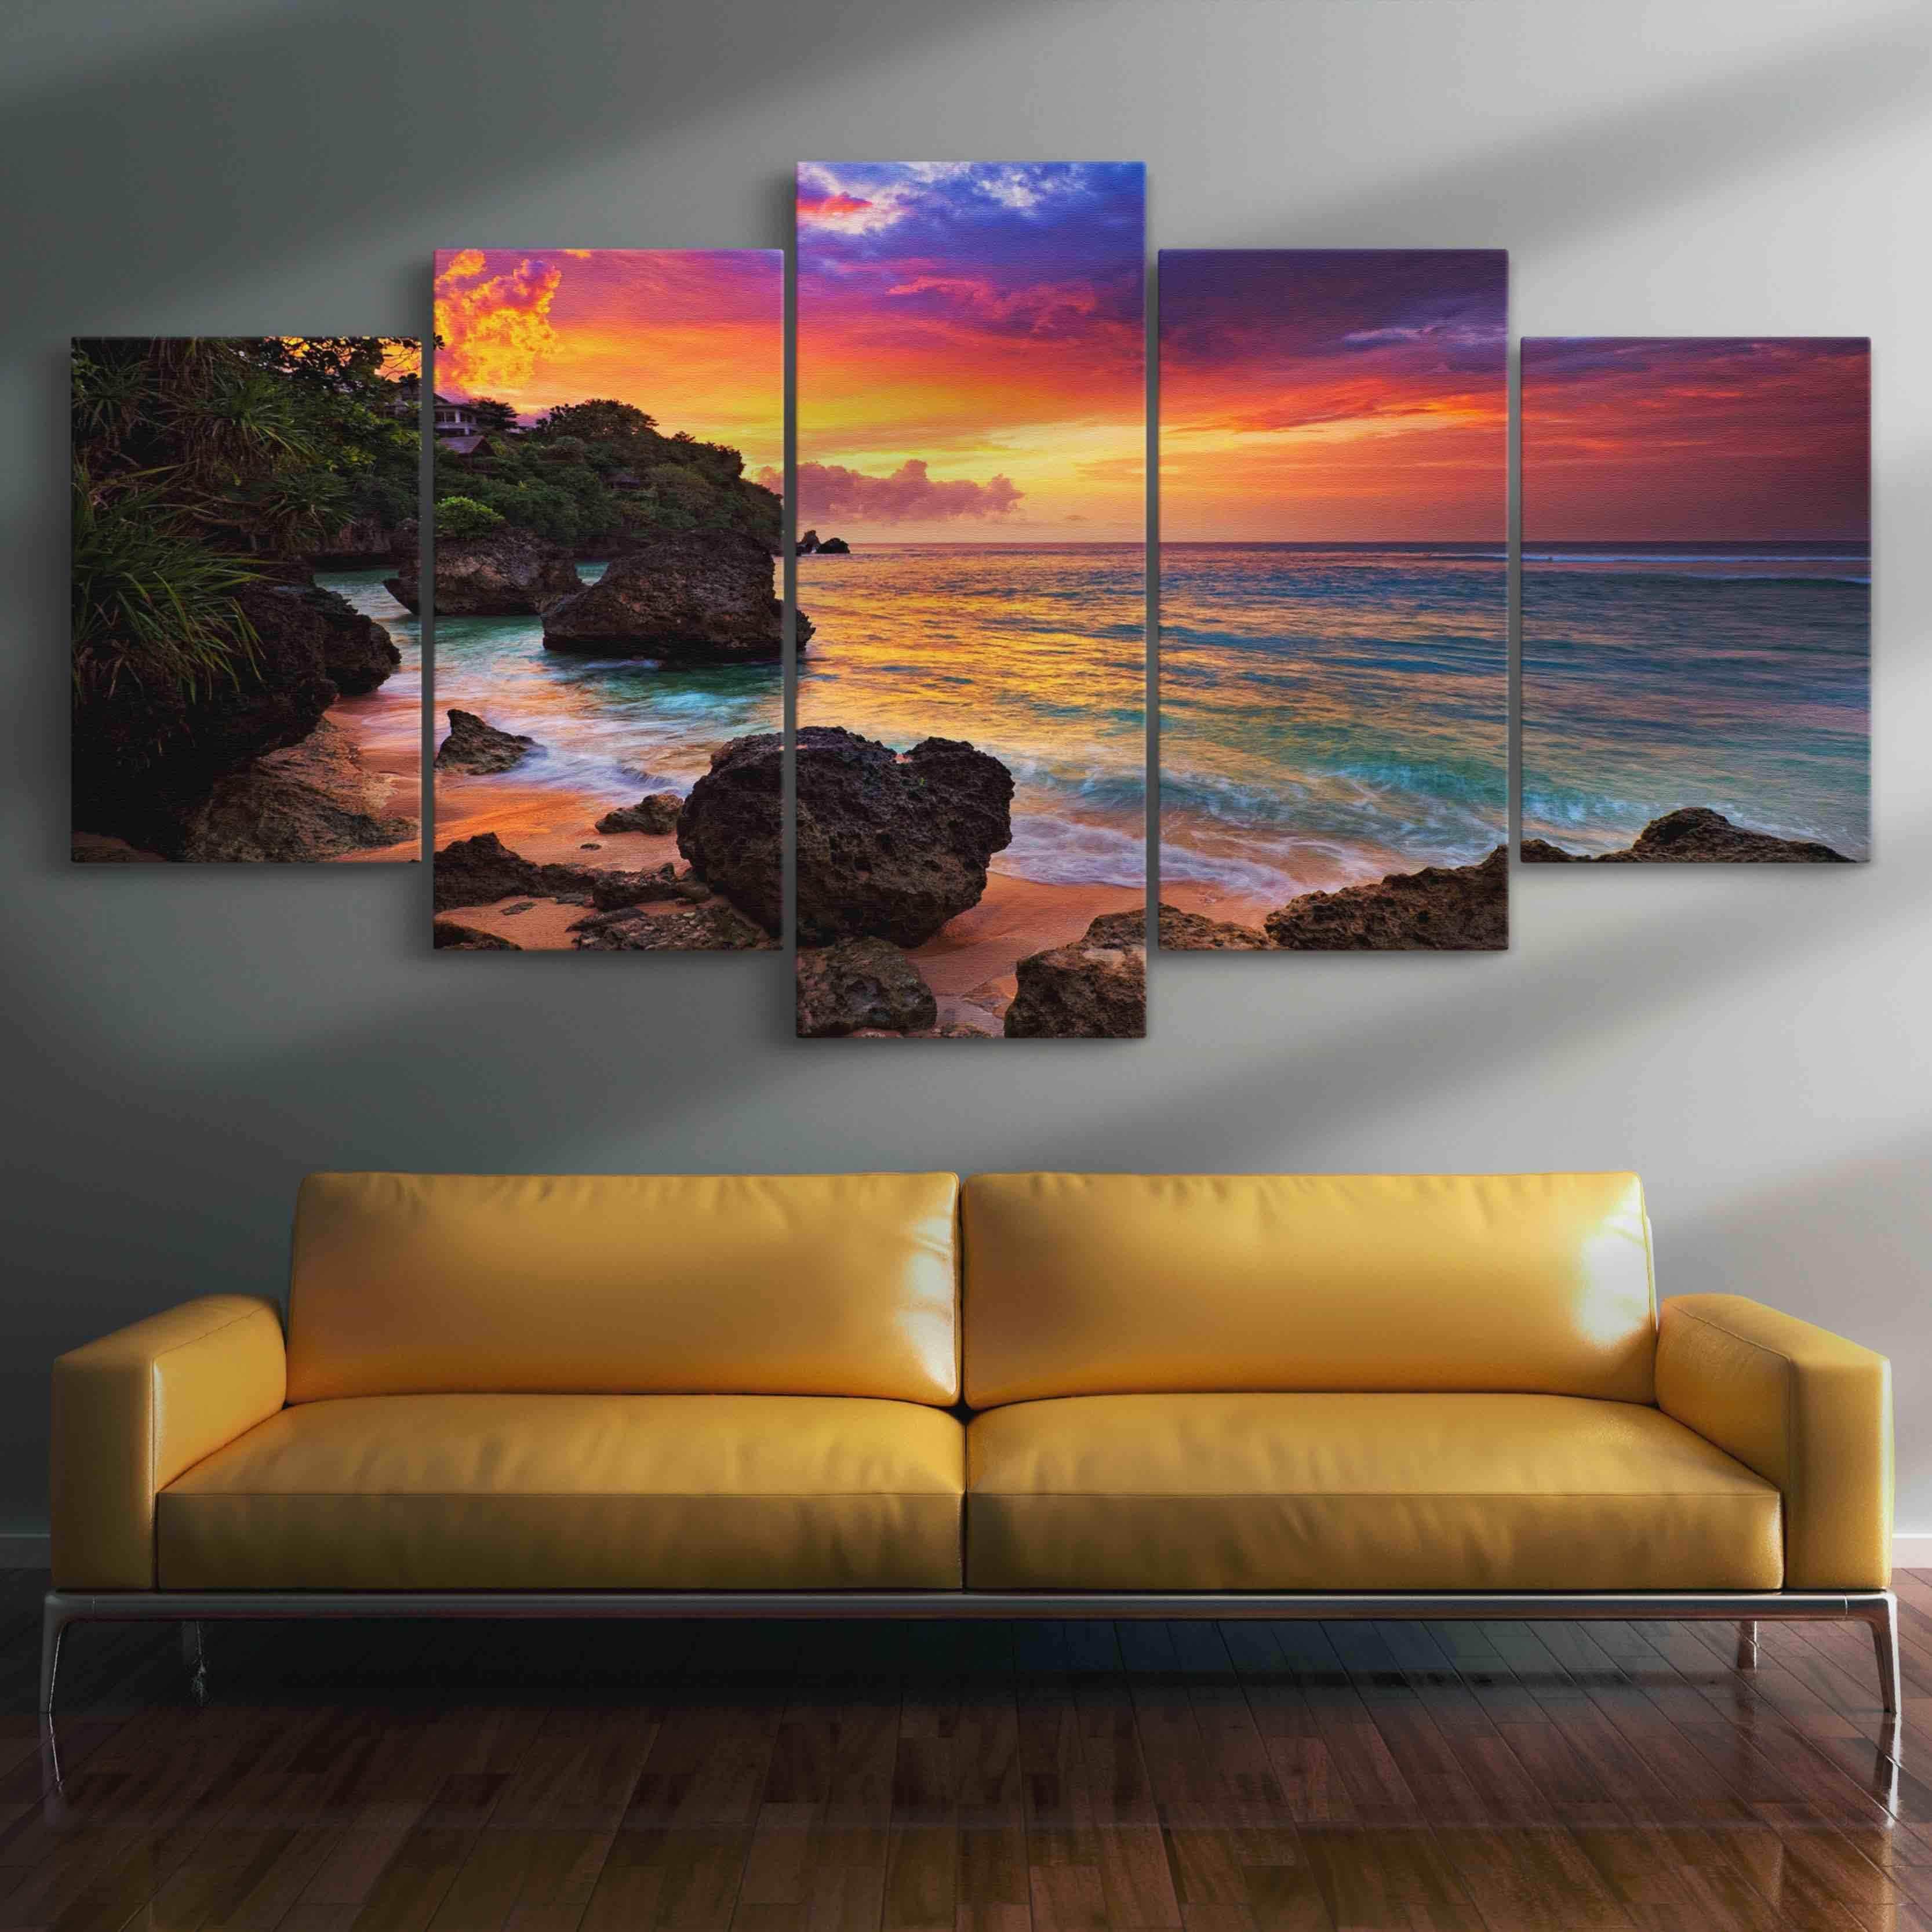 5P Canvas Sunset Beach Romance 5 panel wall art canvas